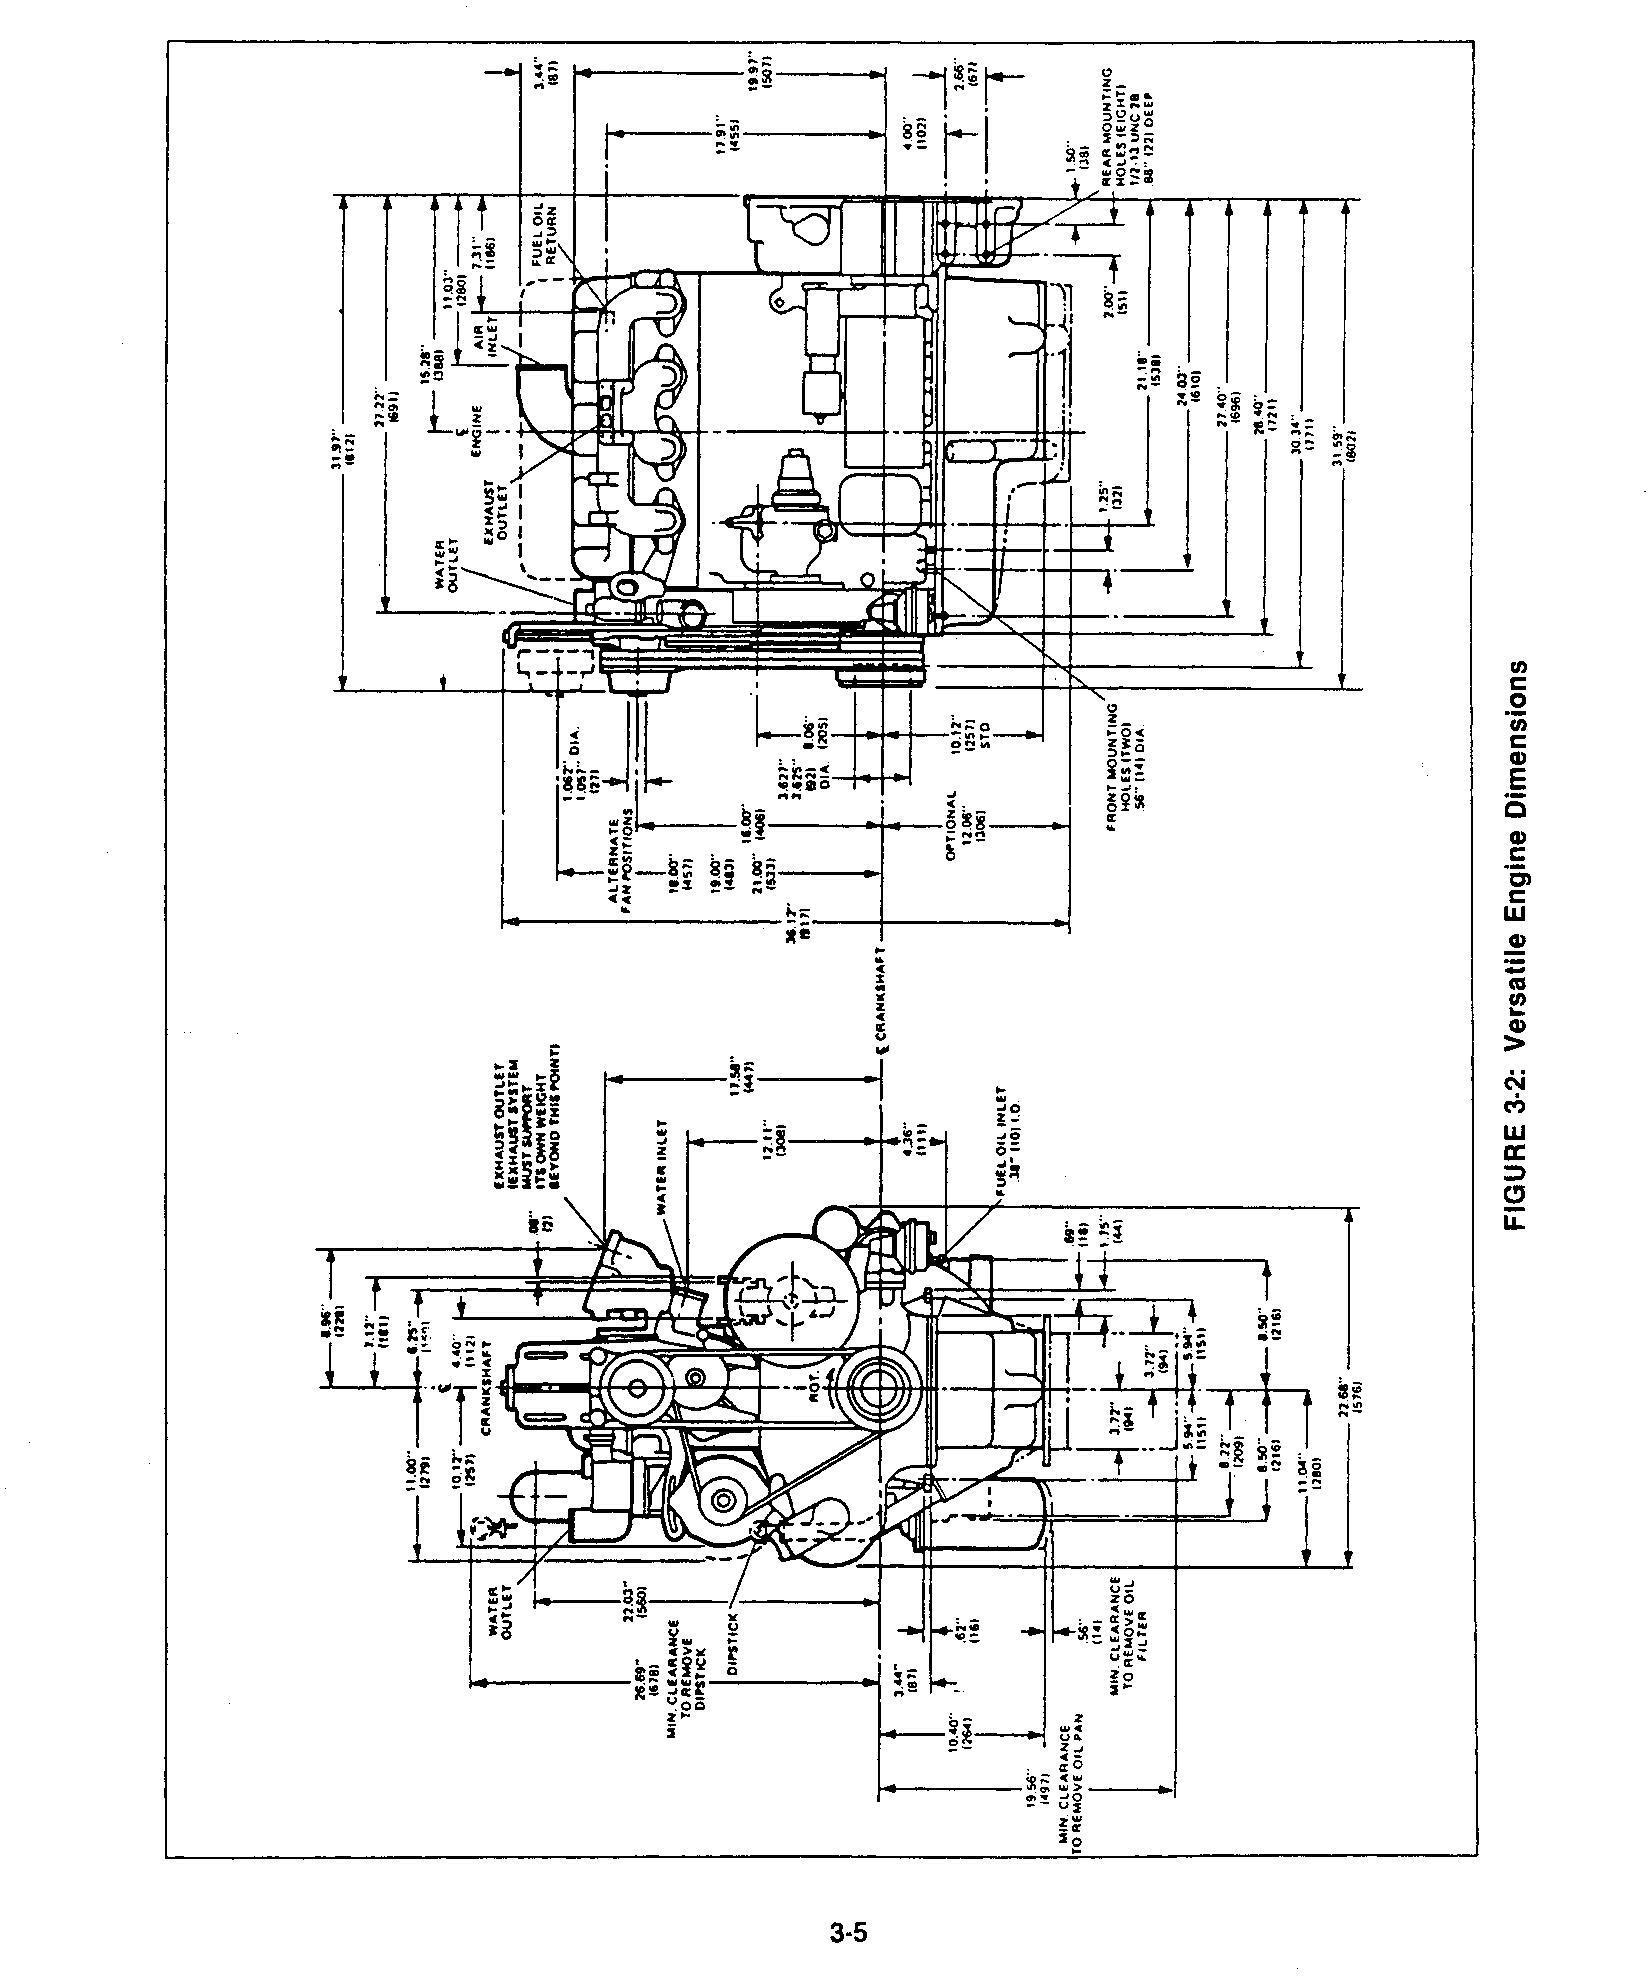 Ford Versatile Swather 4400 Gas & Diesel Service Manual